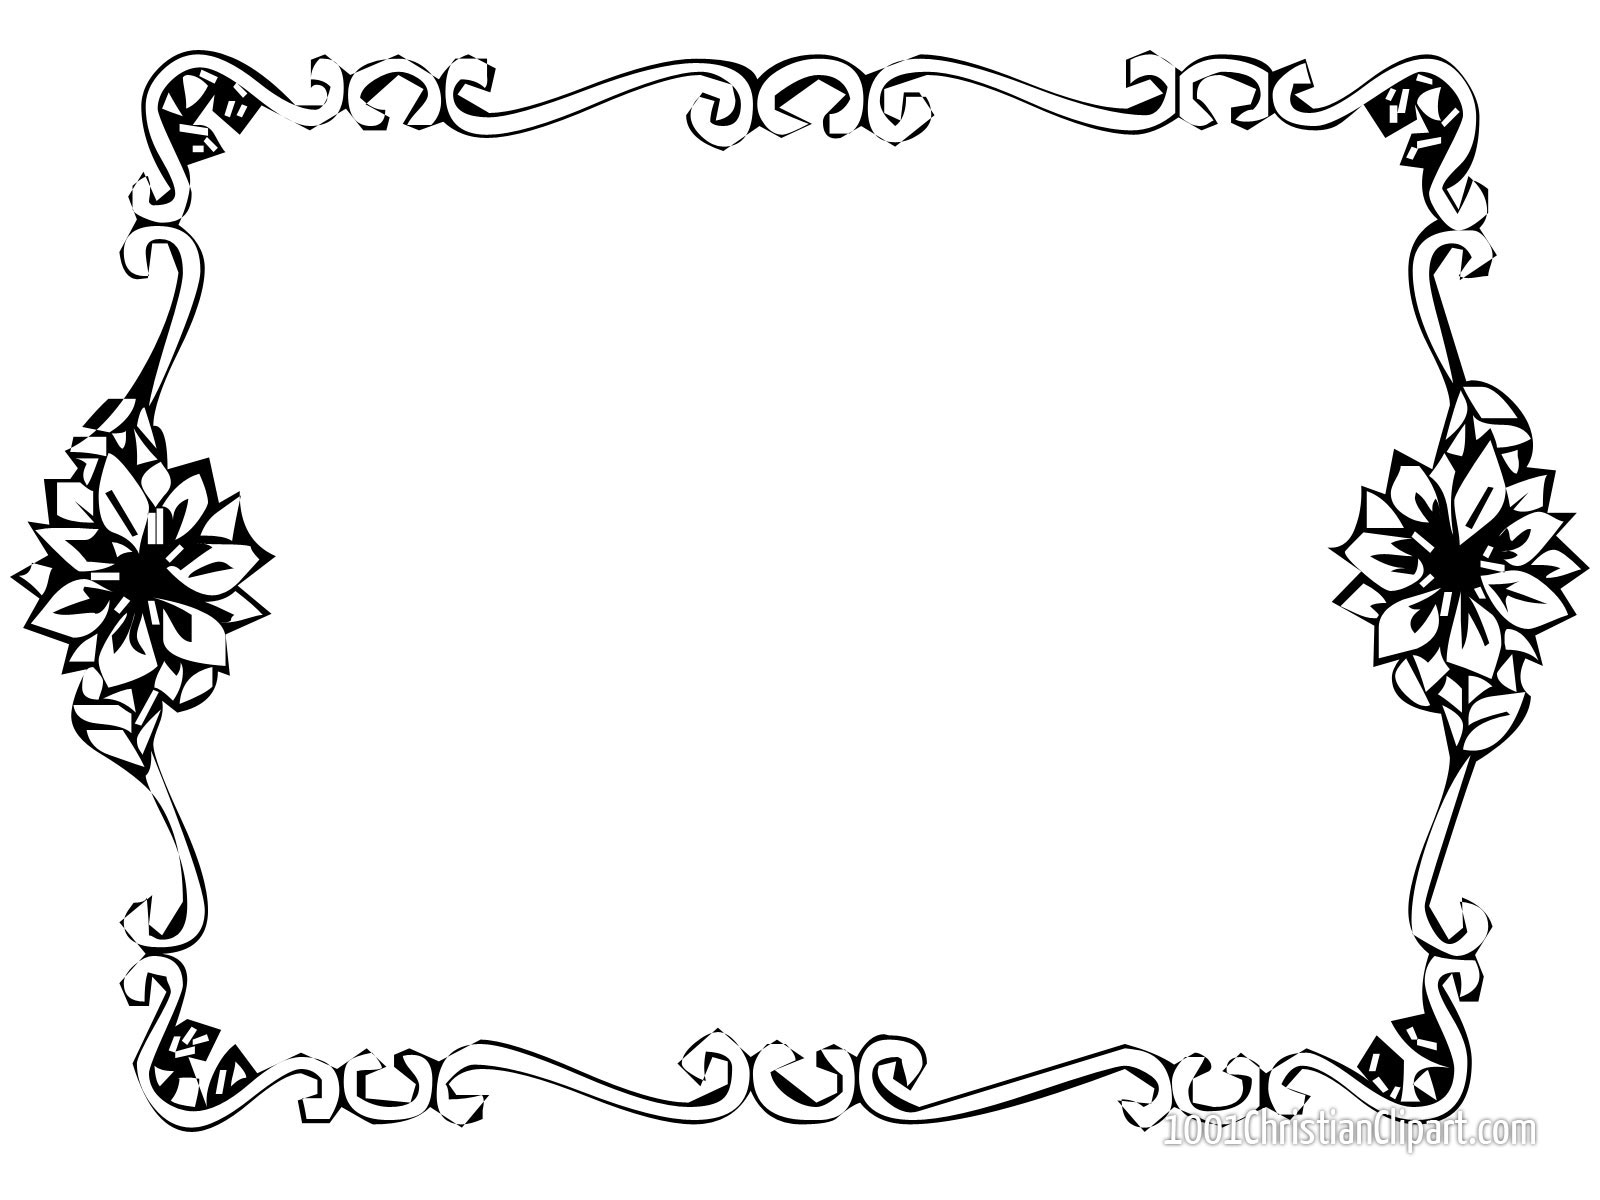 border designs